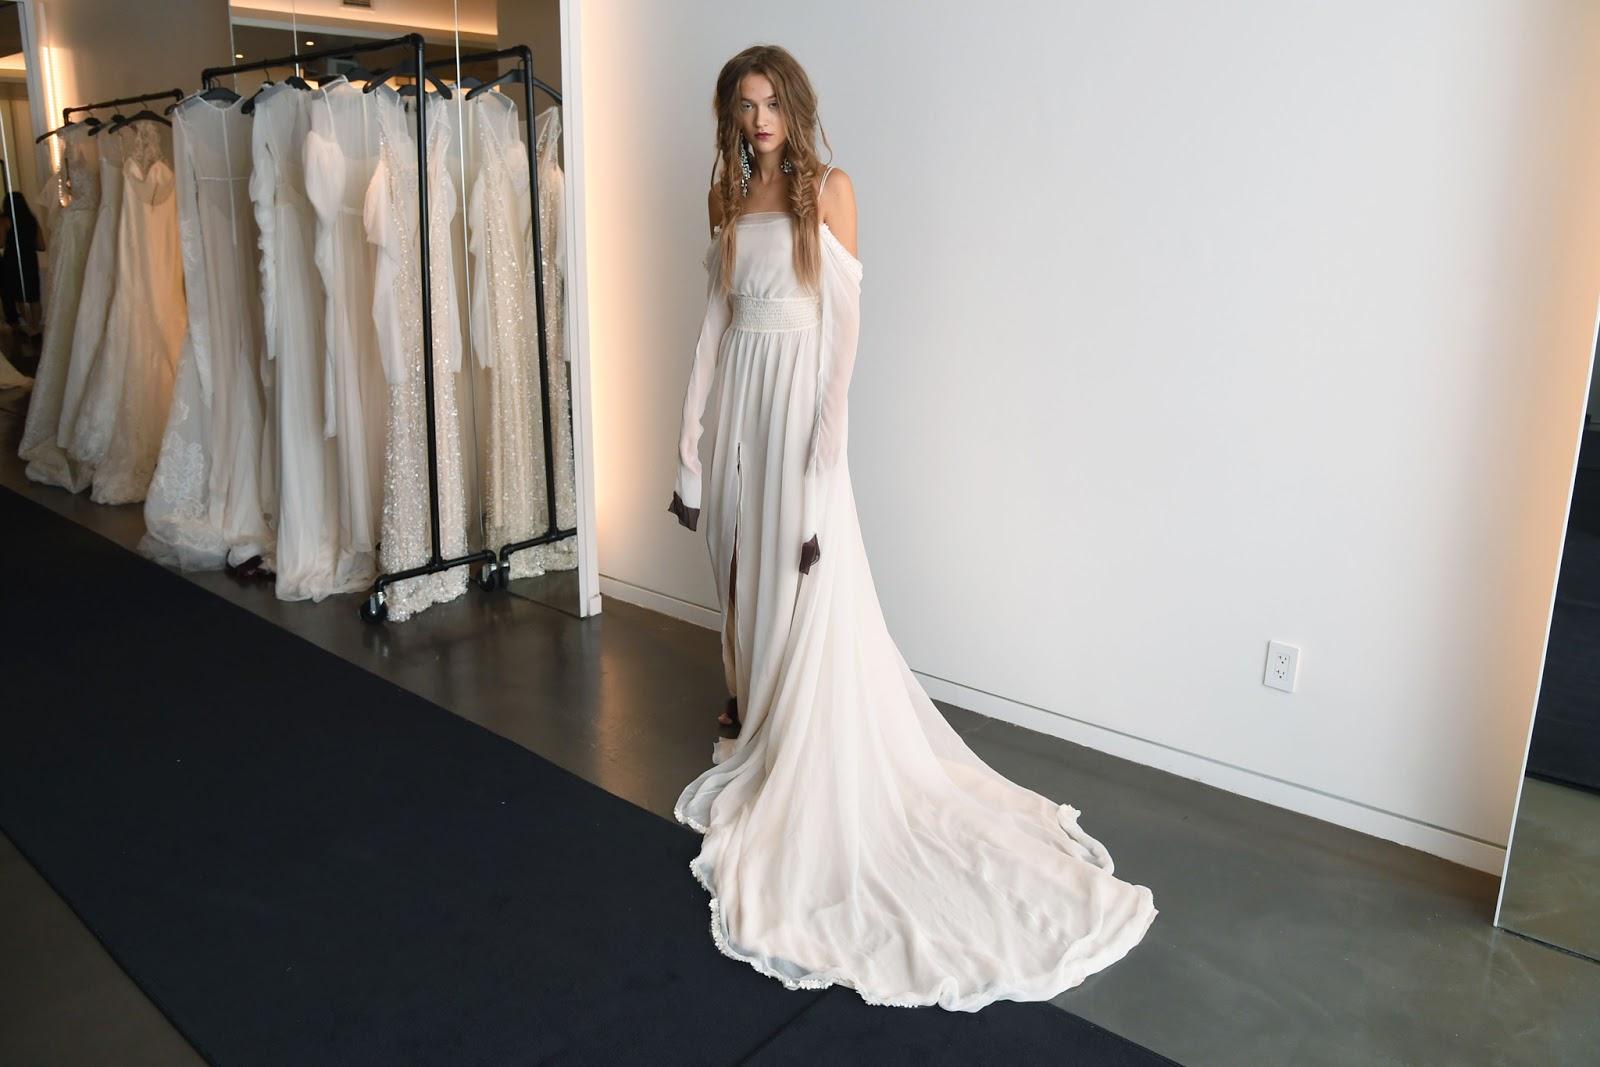 Vera wang wedding dresses 2017 for Wedding dresses by vera wang 2017